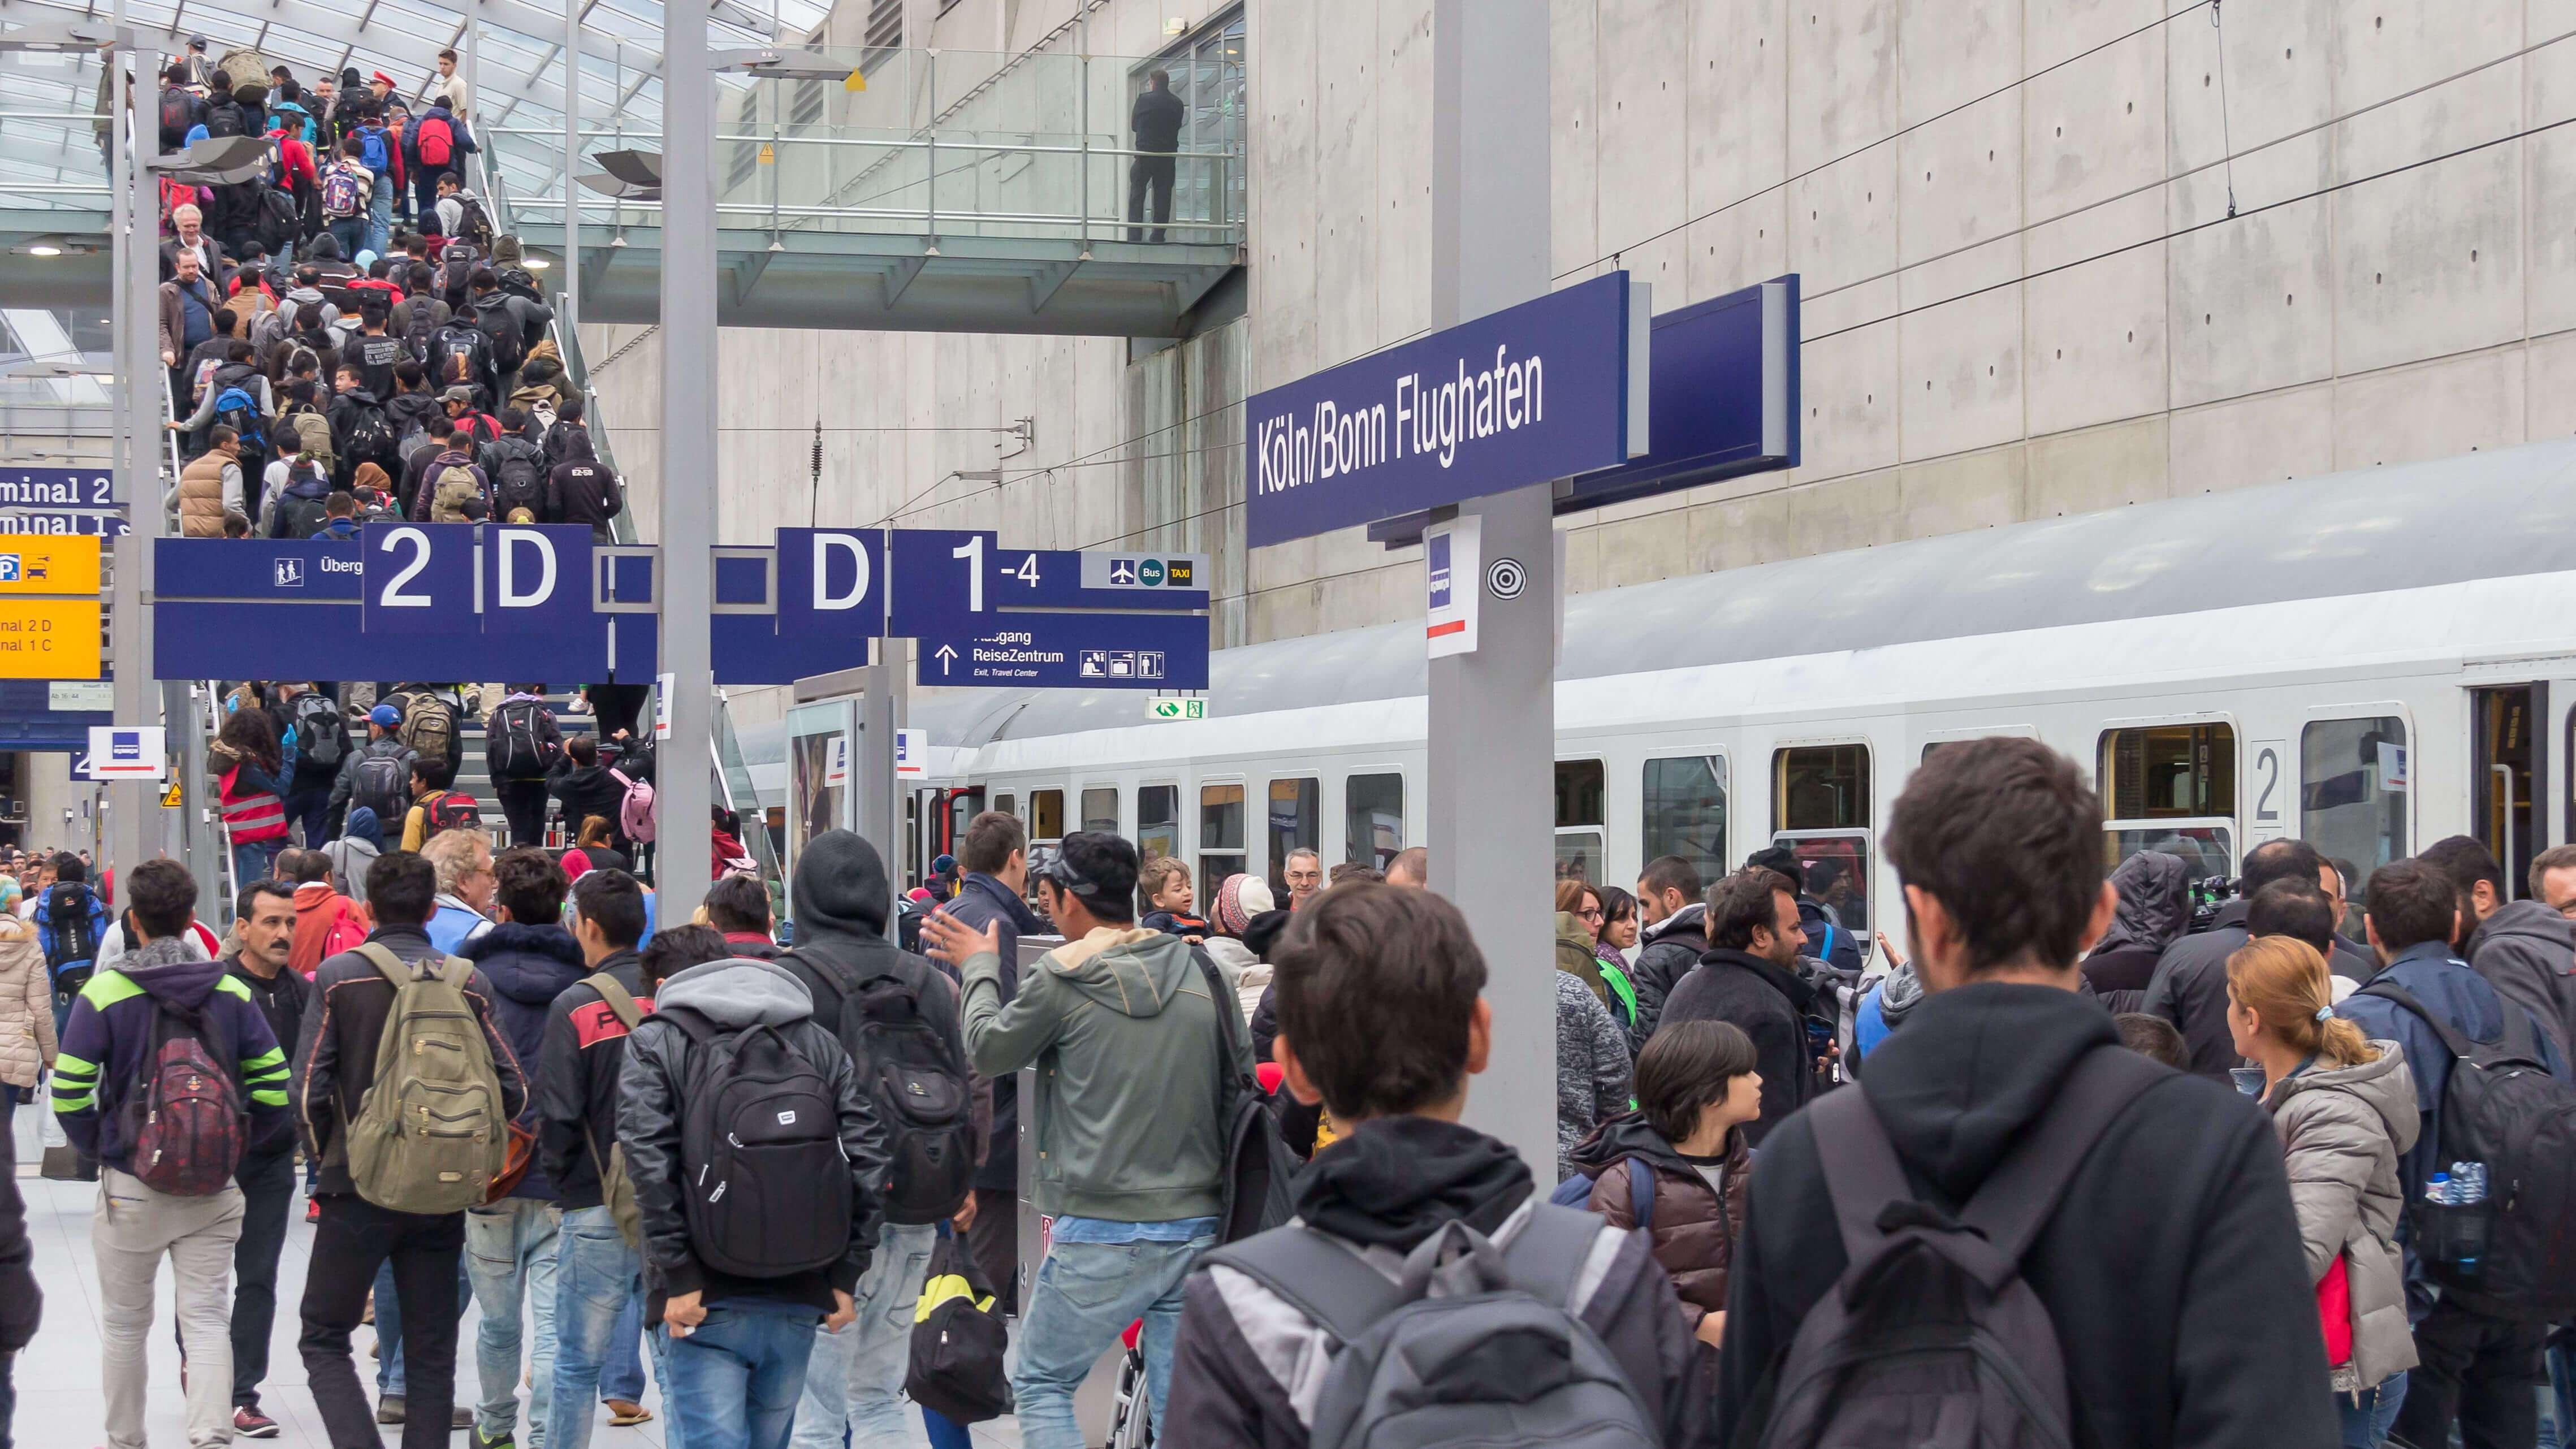 Drehscheibe Köln-Bonn Airport - Ankunft Flüchtlinge 5. Oktober 2015